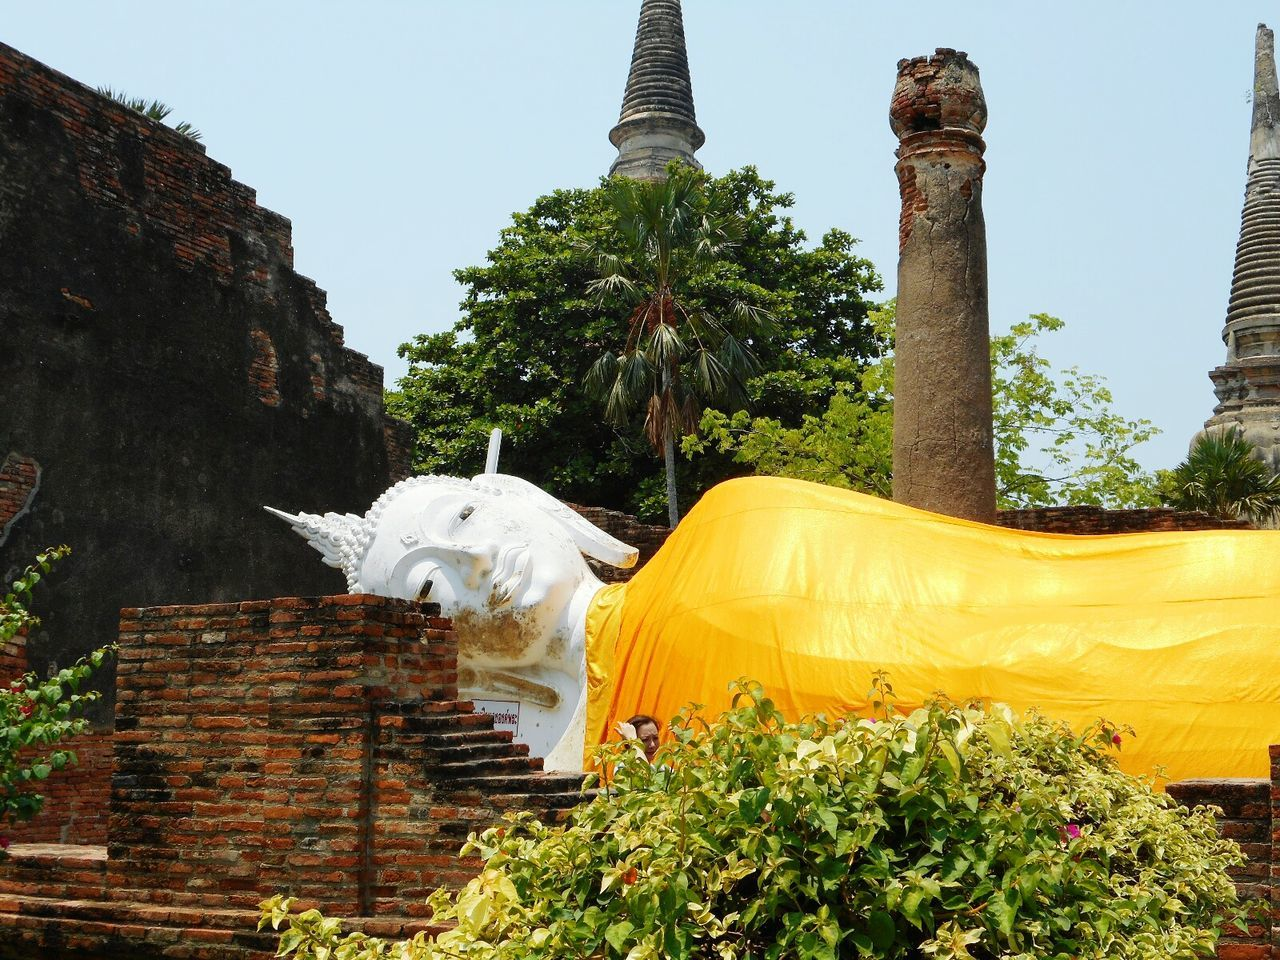 Religion Cultures Pagoda Spirituality Built Structure Tailandia Travel Buda Ayyuthaya Travel Destinations Thai Thailand Buddhism Buddha Statue Ayutthaya Historic Park Ayutthaya Tailandia. Buddhist Buddha Sculpture Clear Sky Spirituality Architecture Buddhist Temple Budismo